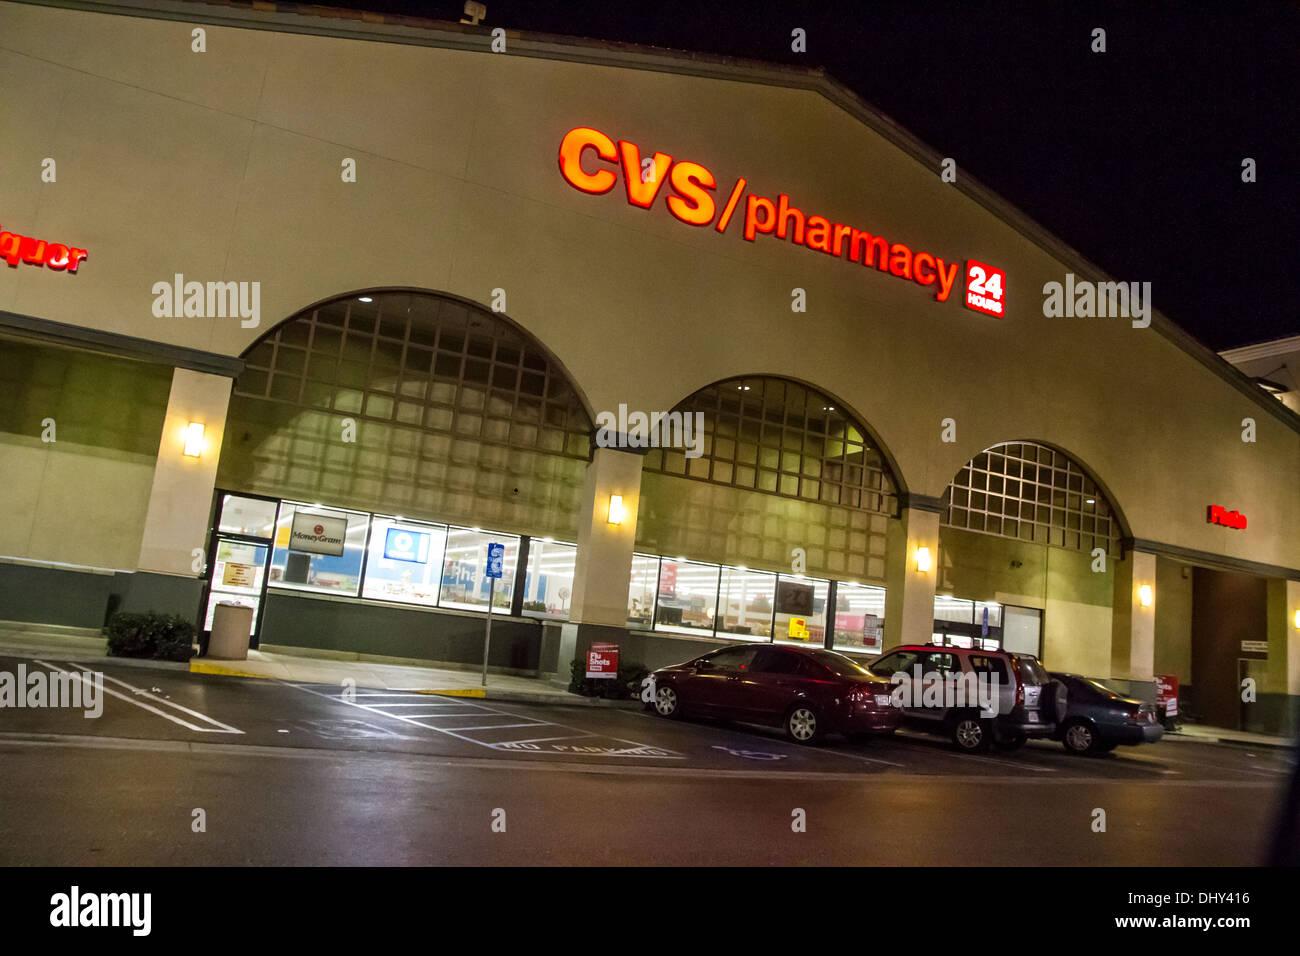 Cvs Health Stock Photos & Cvs Health Stock Images - Alamy